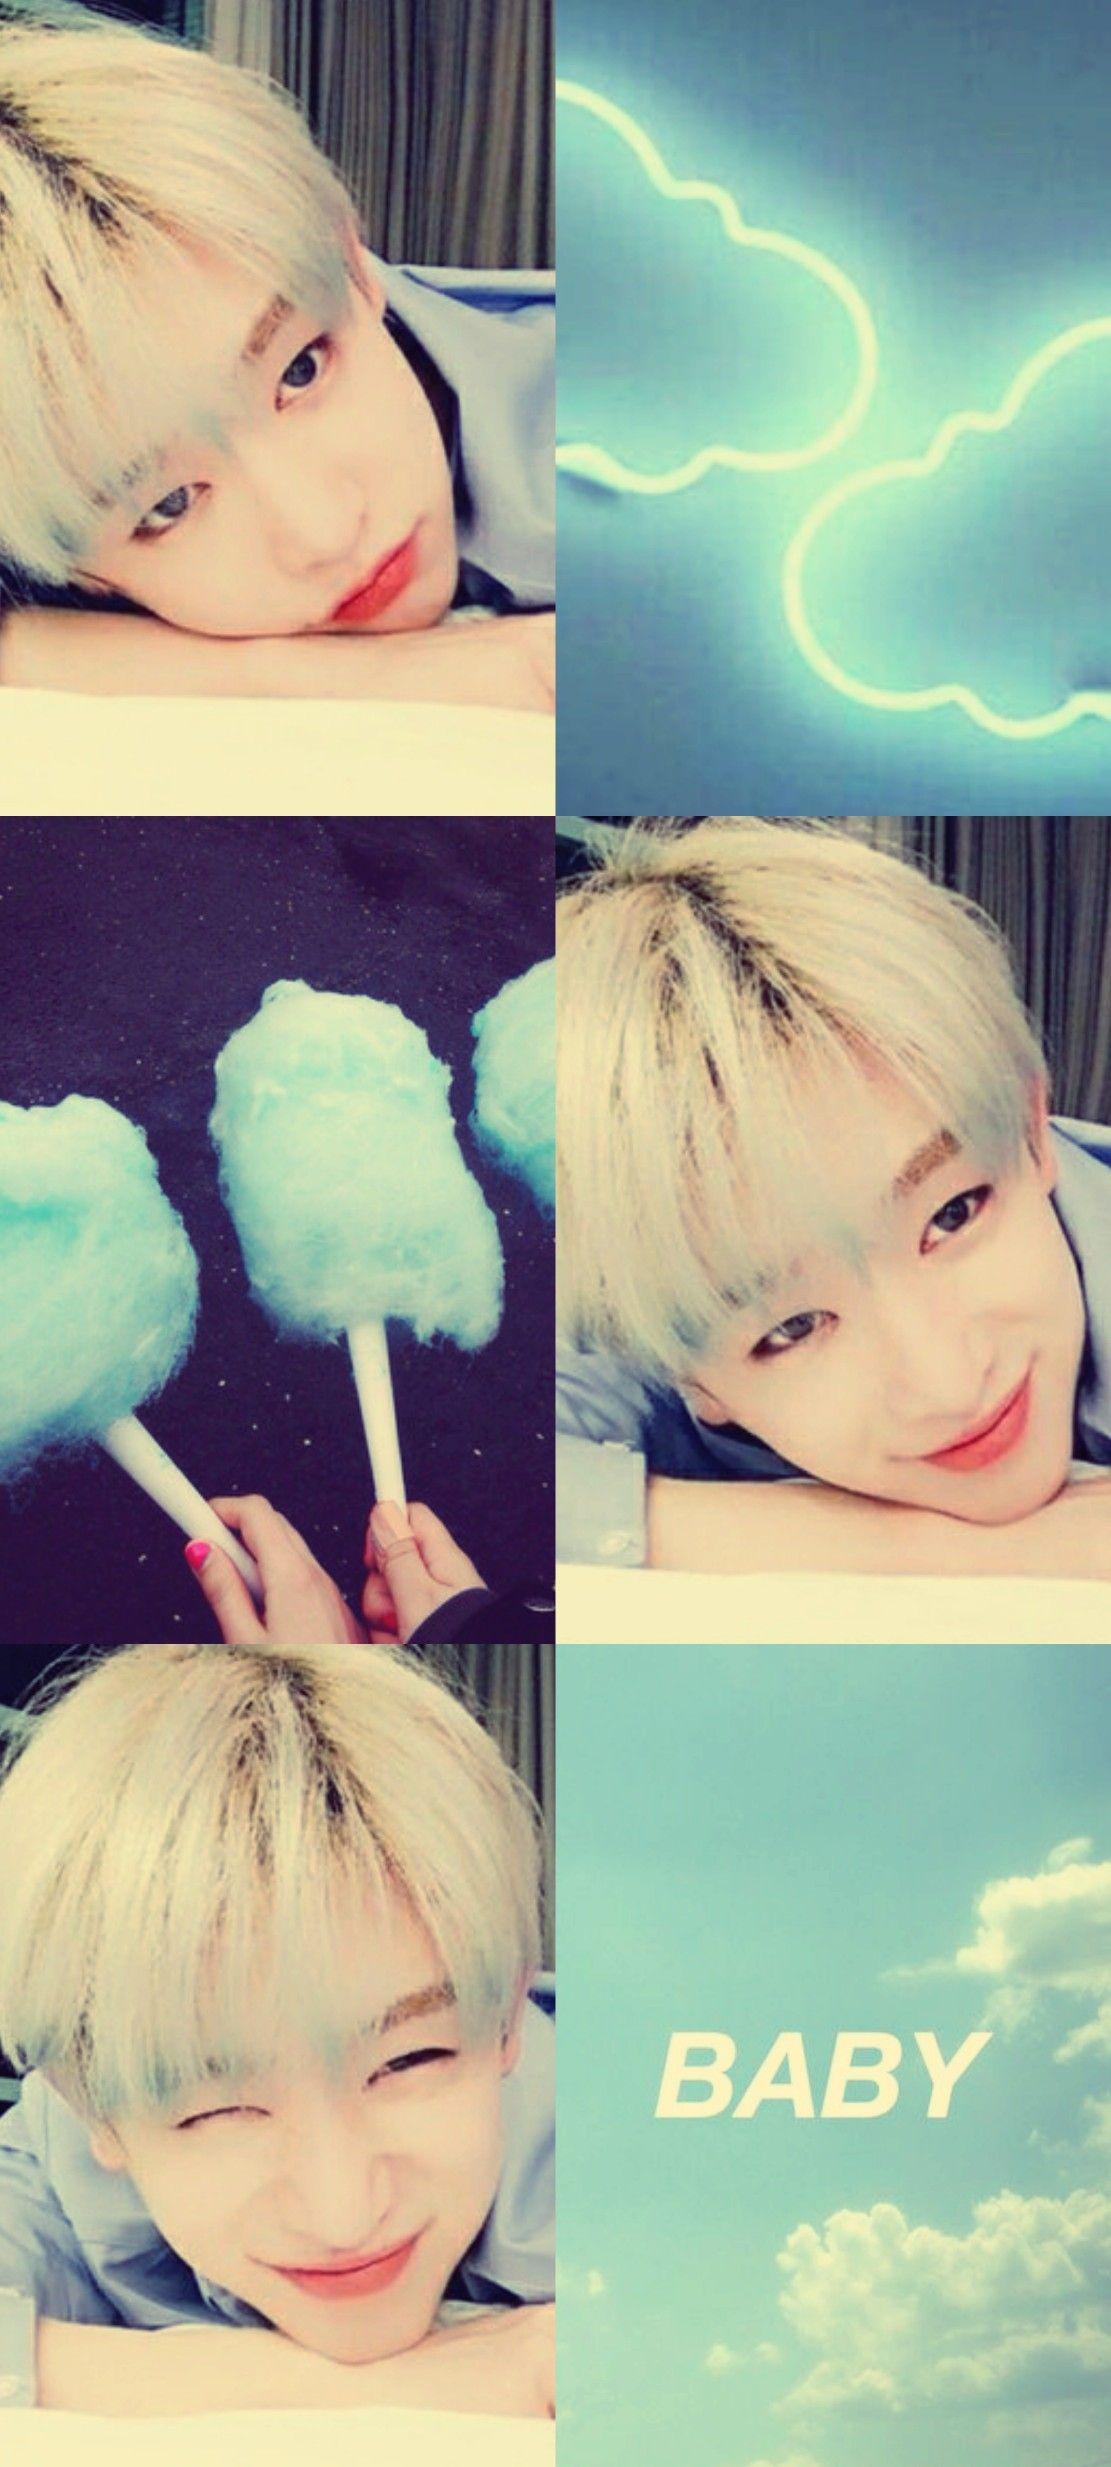 Monsta X Wonho Baby Aesthetic Wallpaper Monsta X Wonho Monsta X Kpop Wallpaper